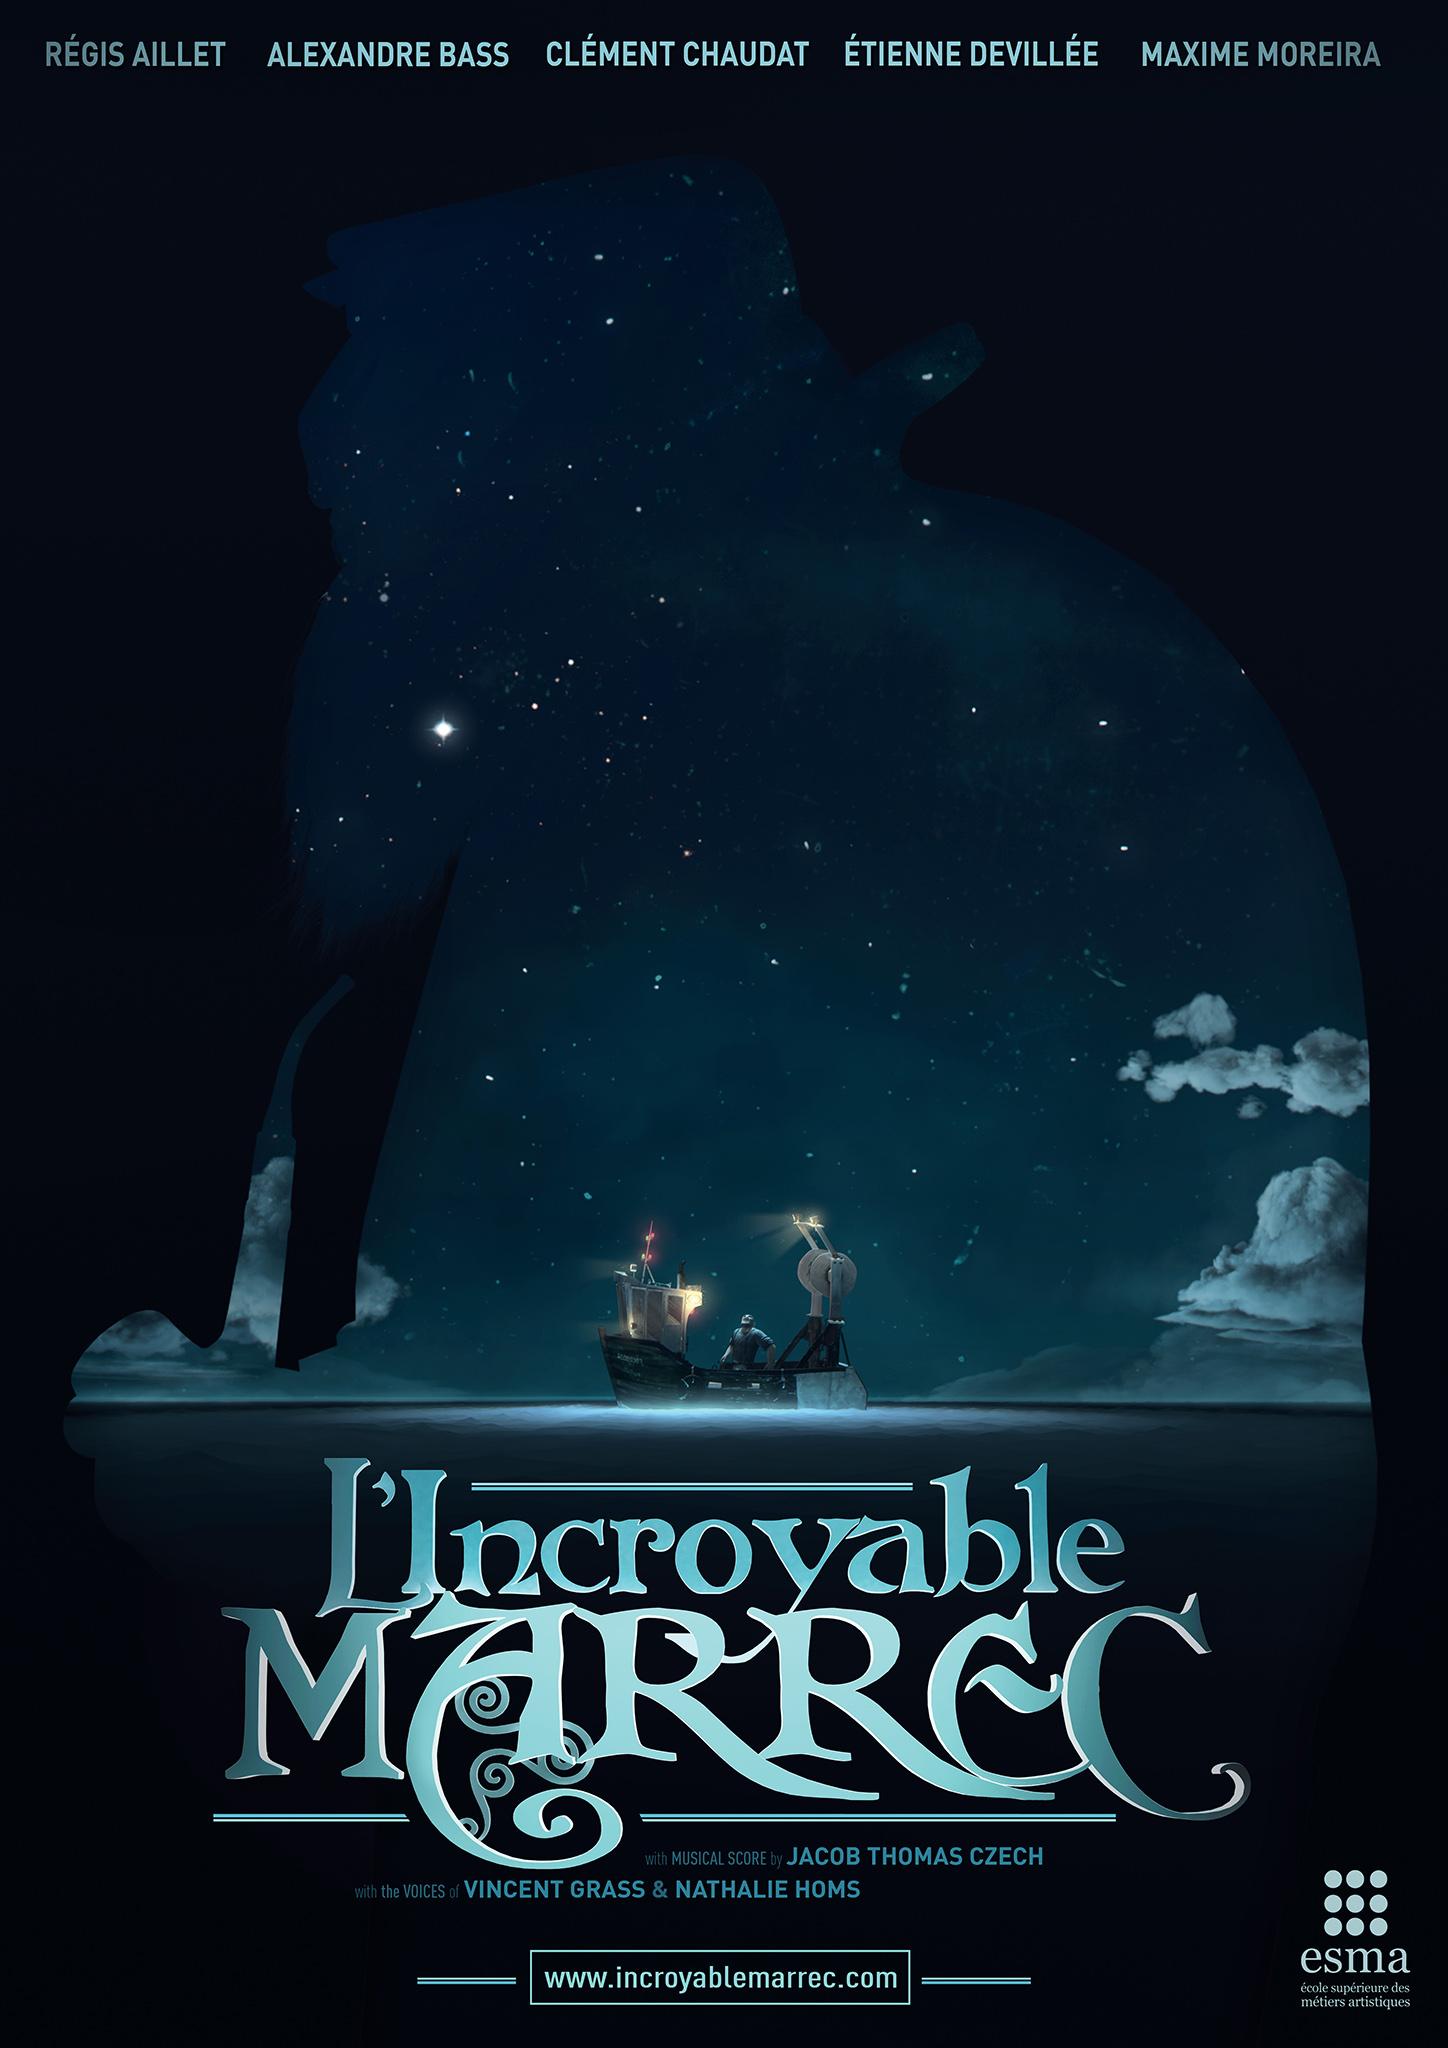 L'Incroyable Marrec kapak